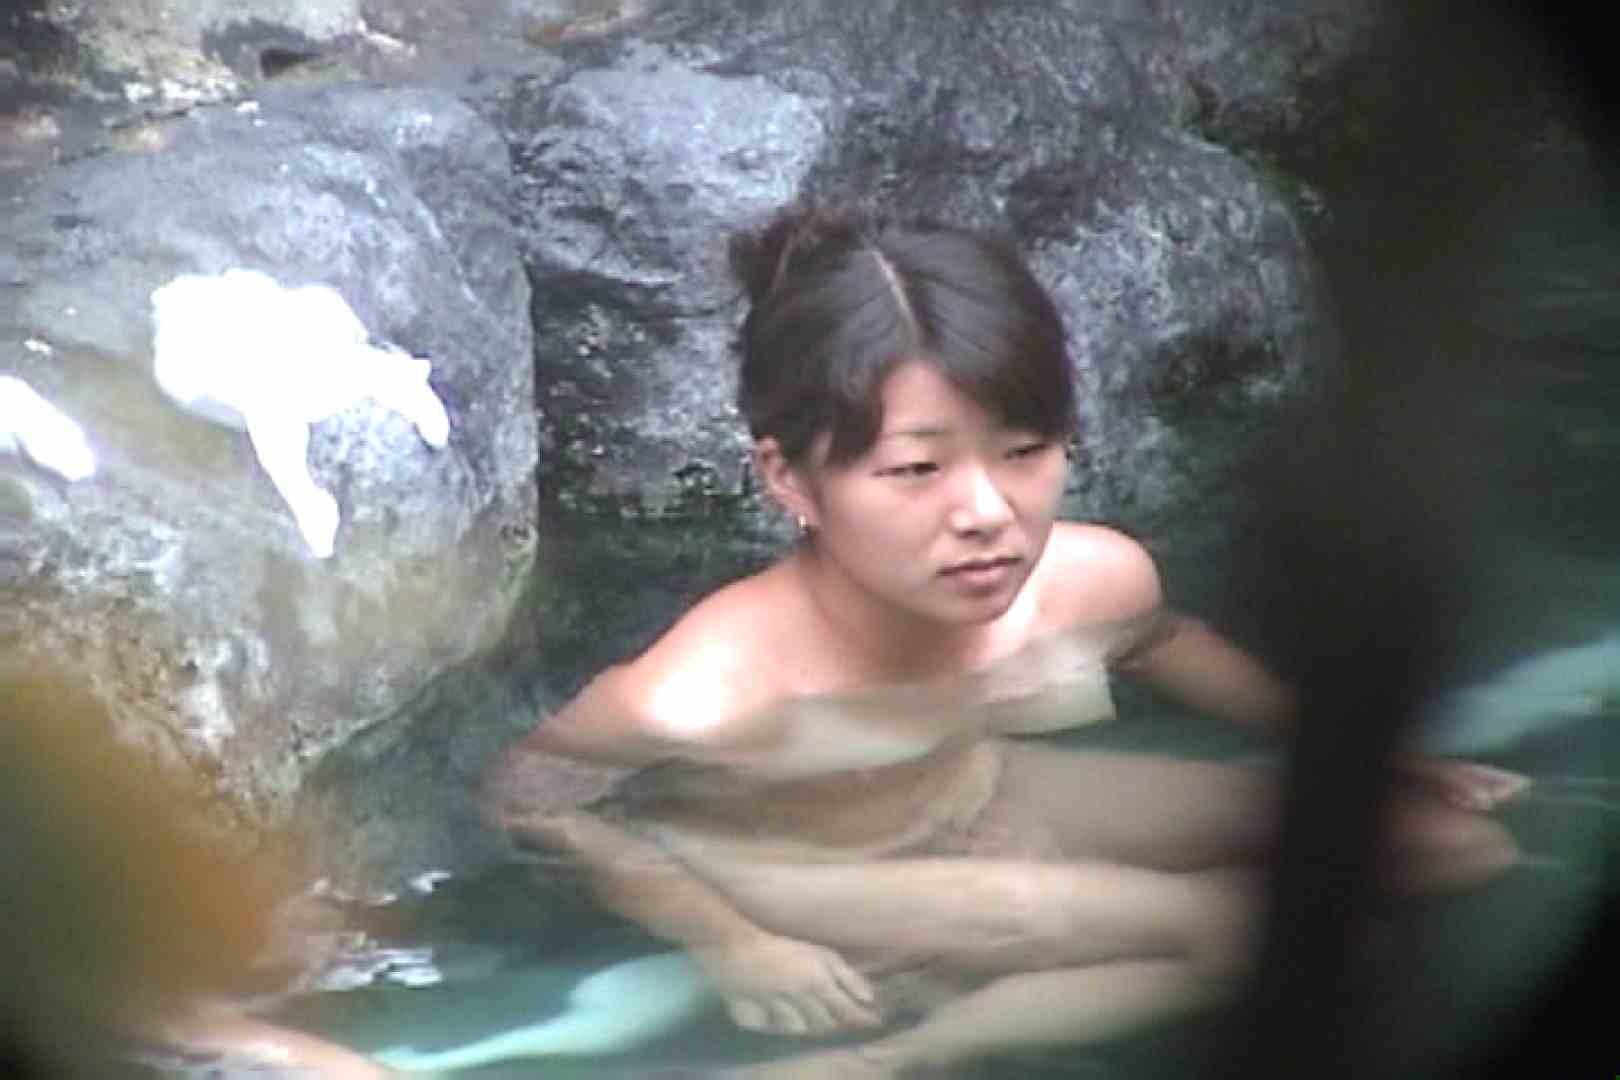 Aquaな露天風呂Vol.69【VIP限定】 OLのエロ生活   露天風呂  106連発 100